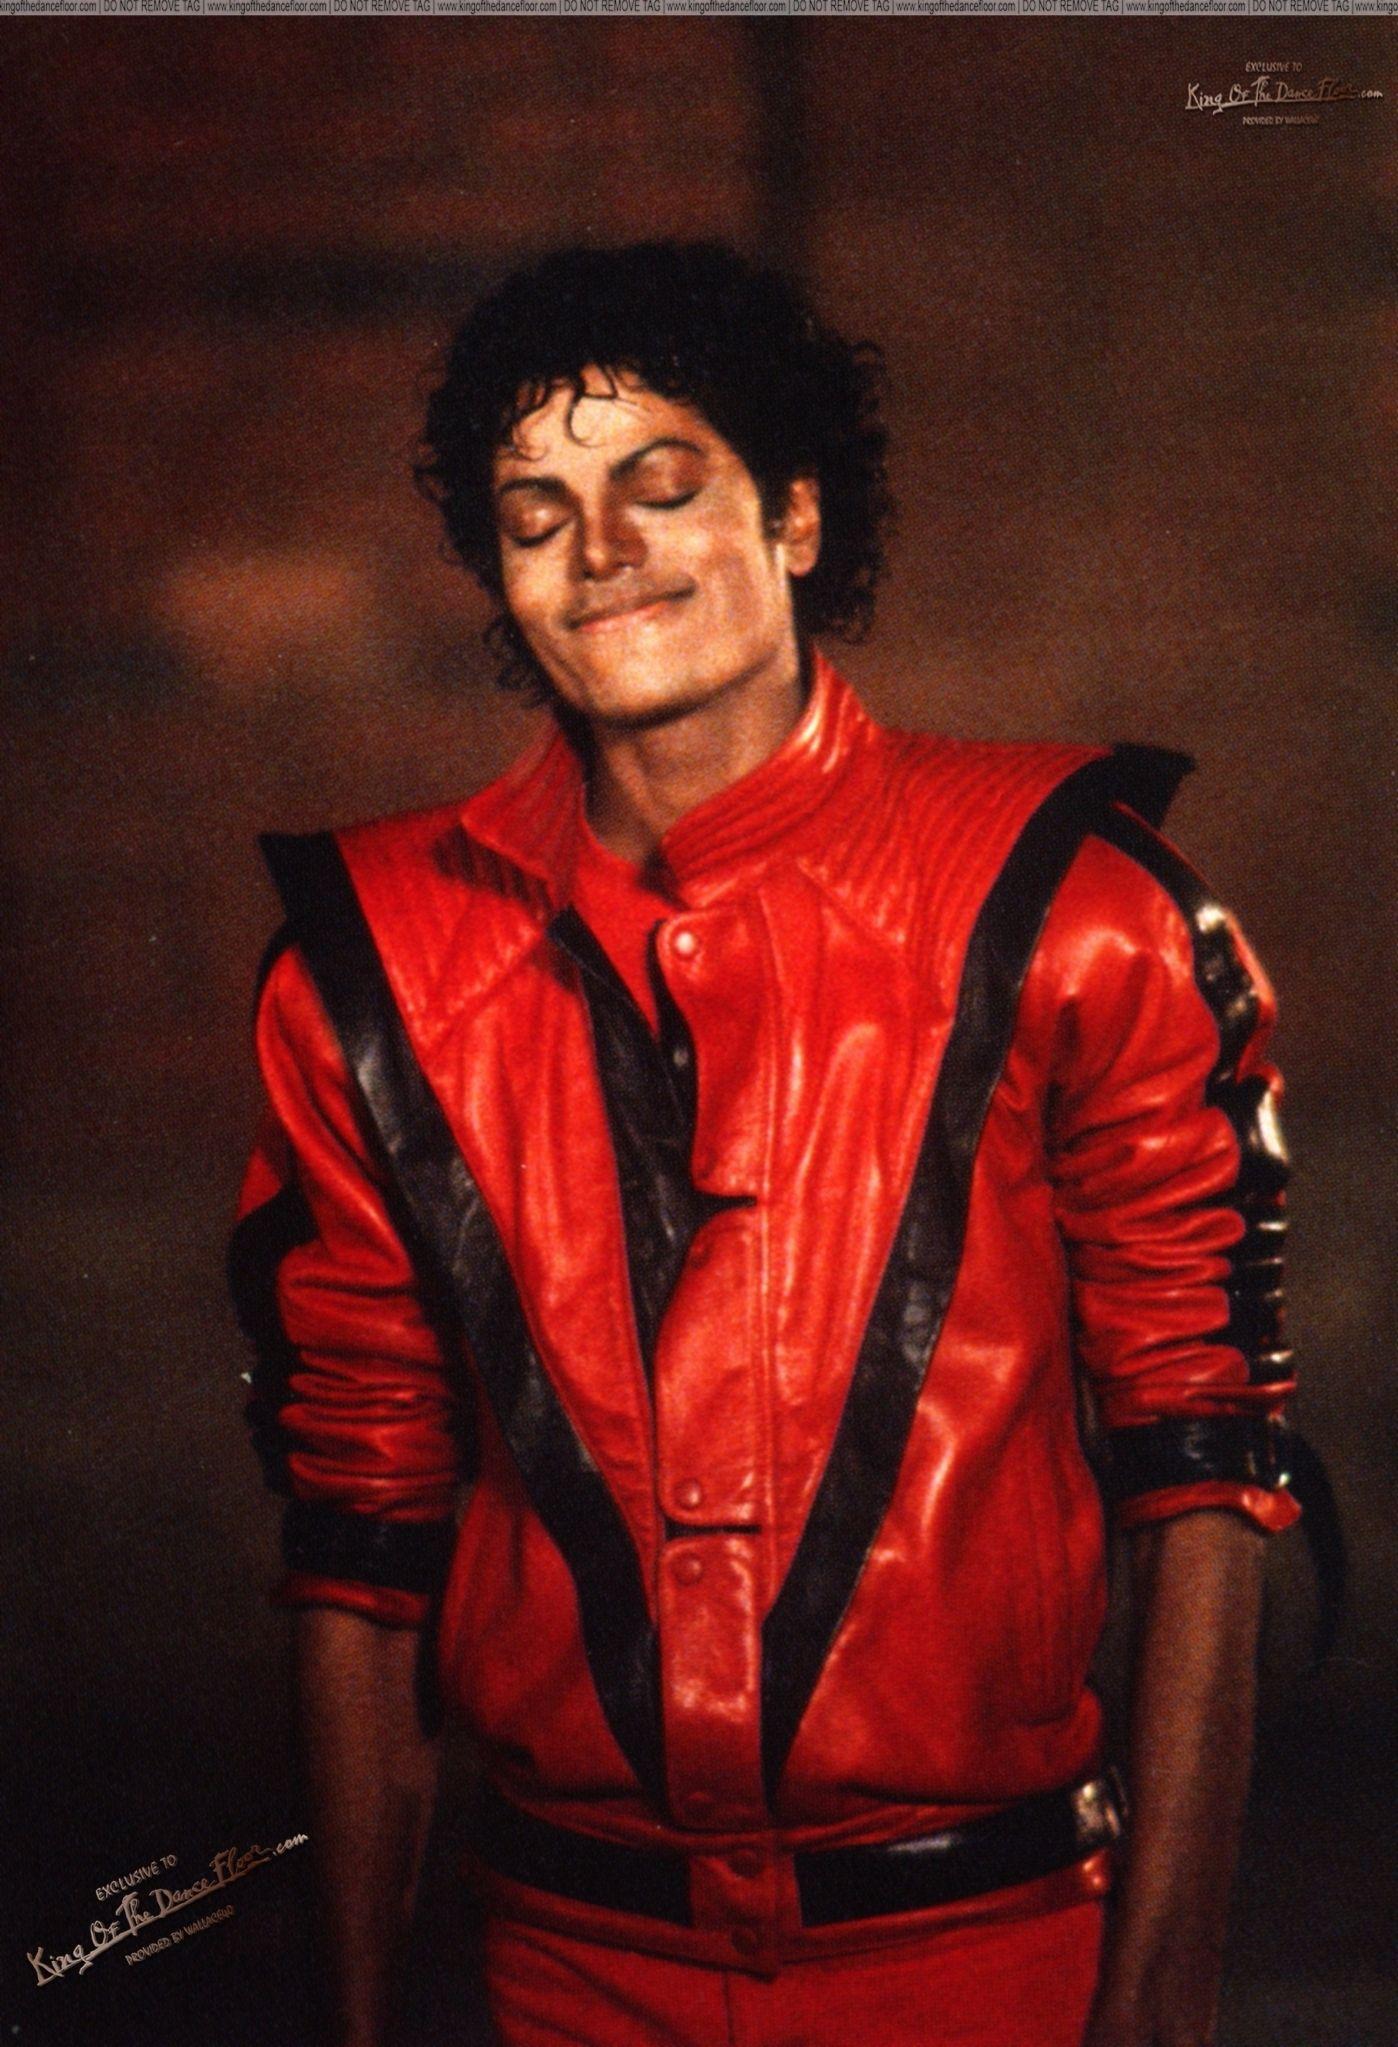 3a6ca47f MJ - The Thriller Era Photo (15876138) - Fanpop Michael Jackson, Red Leather